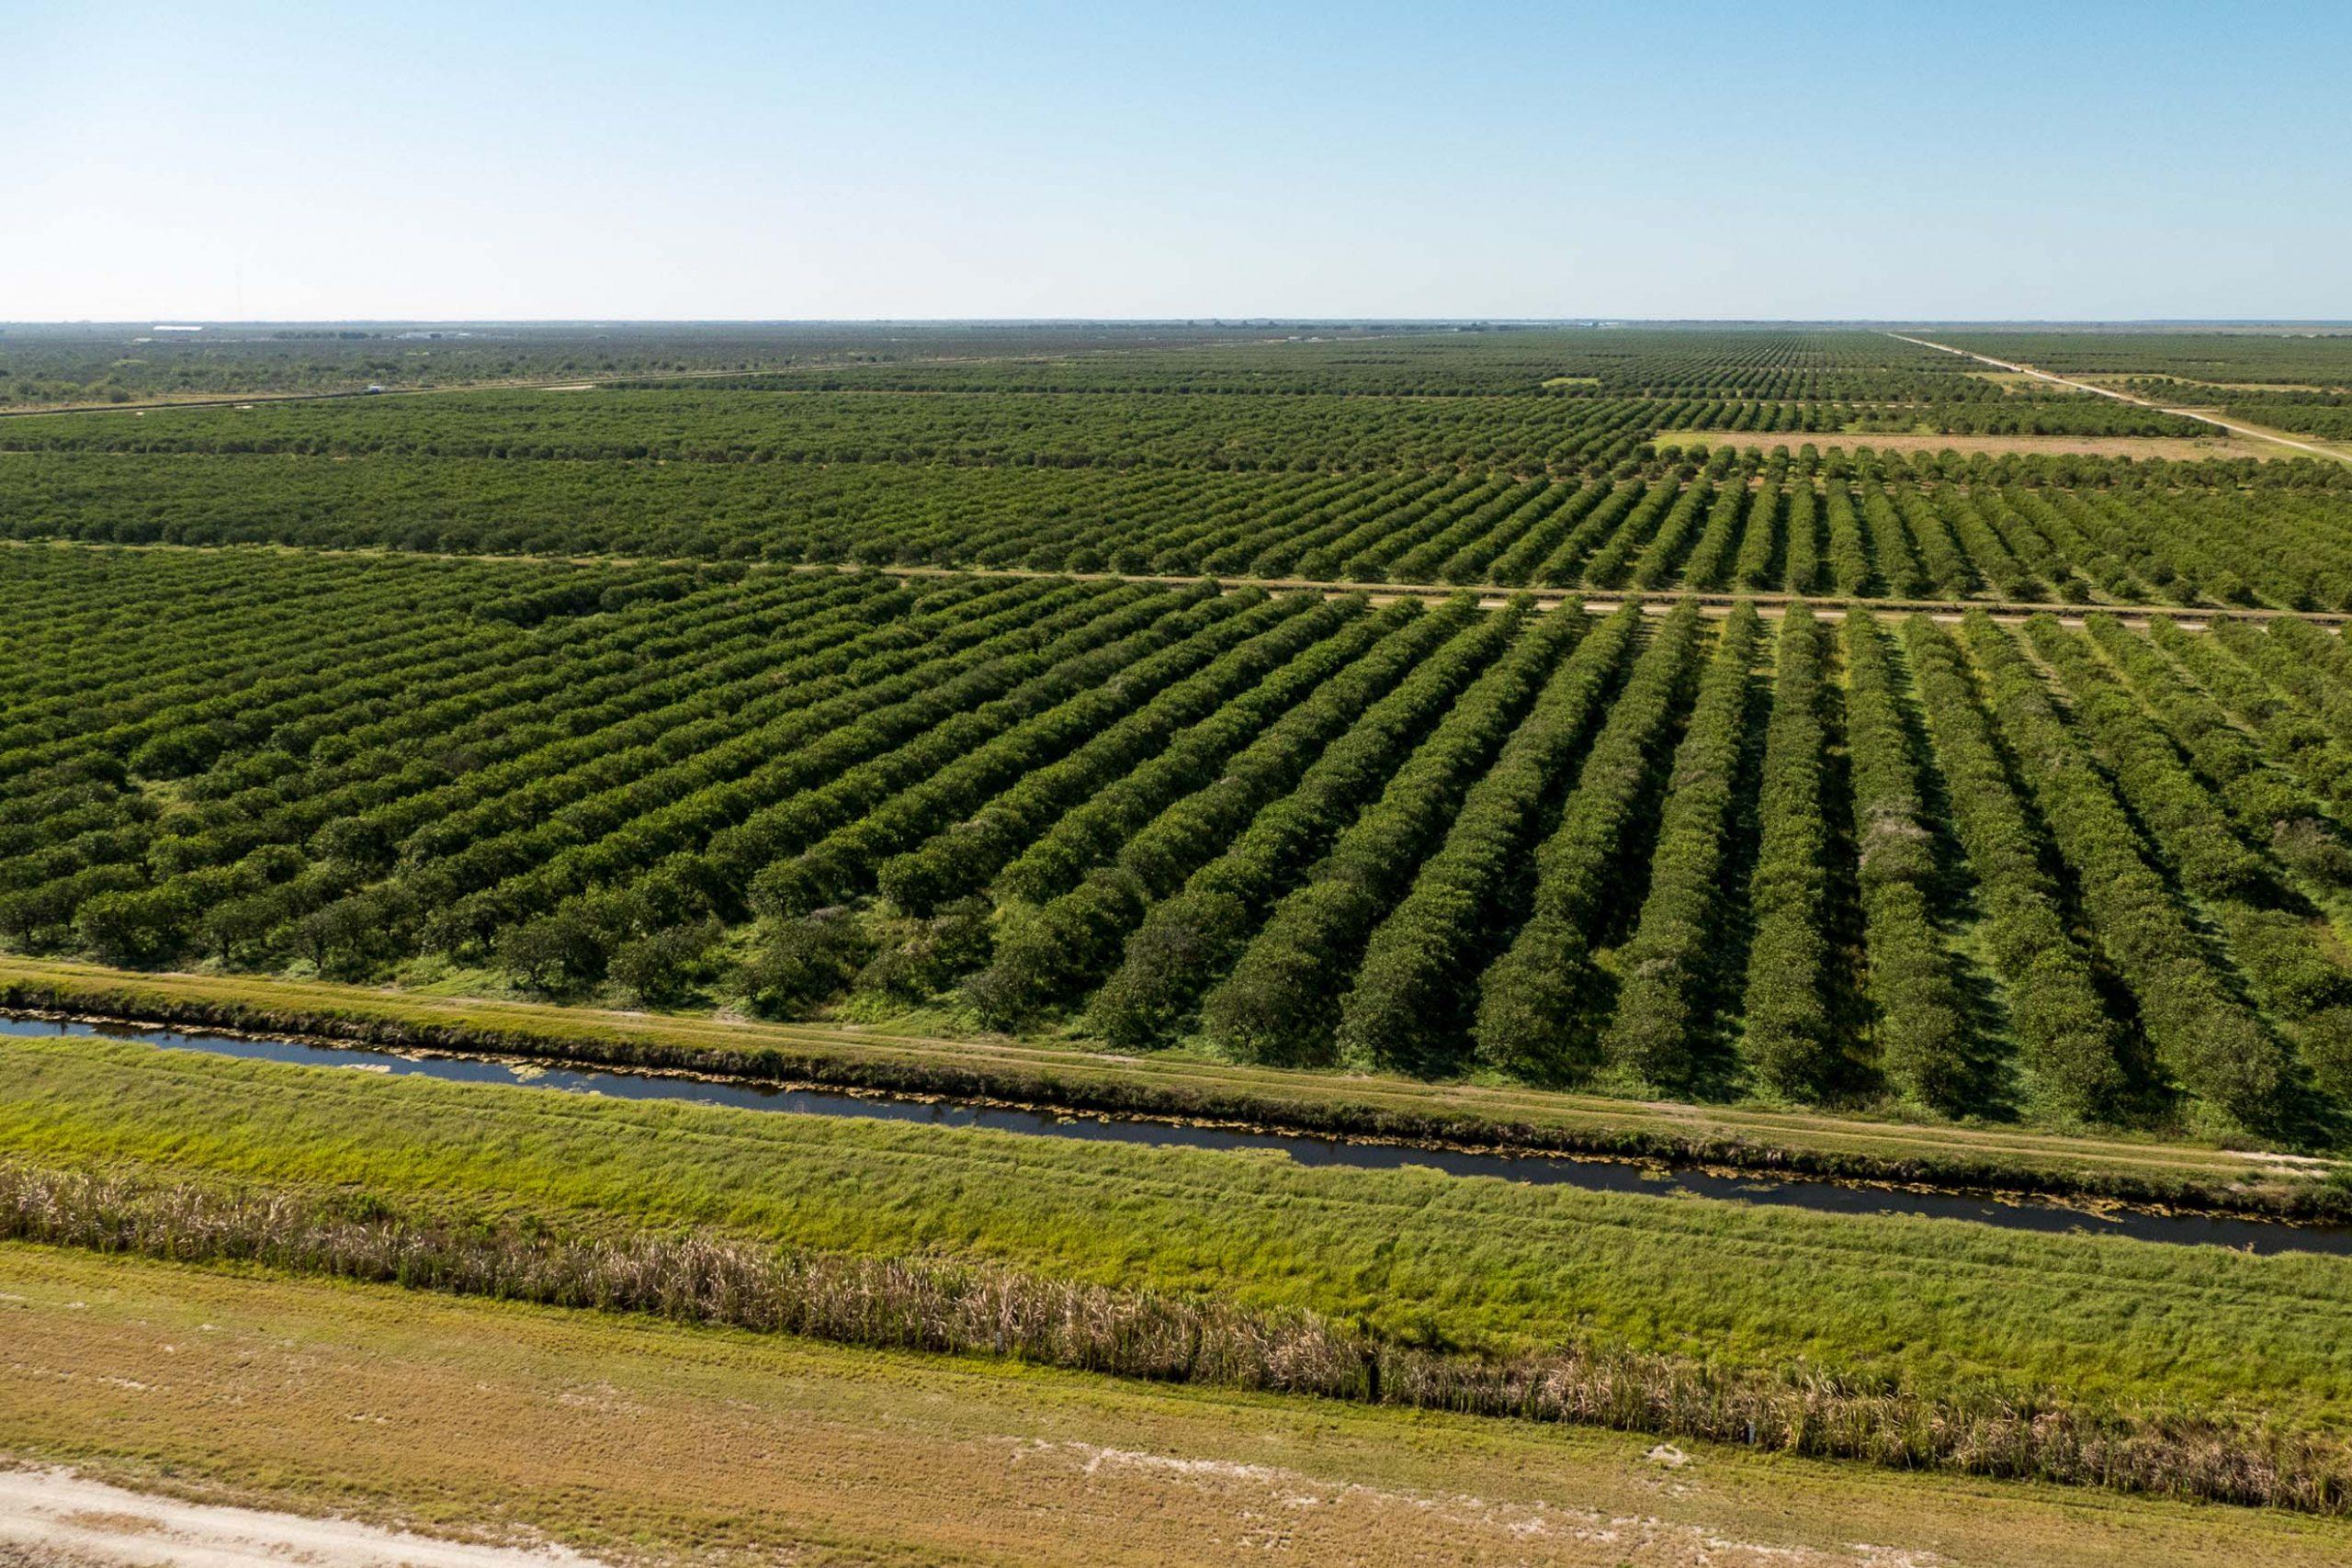 Aerial view of tree farms